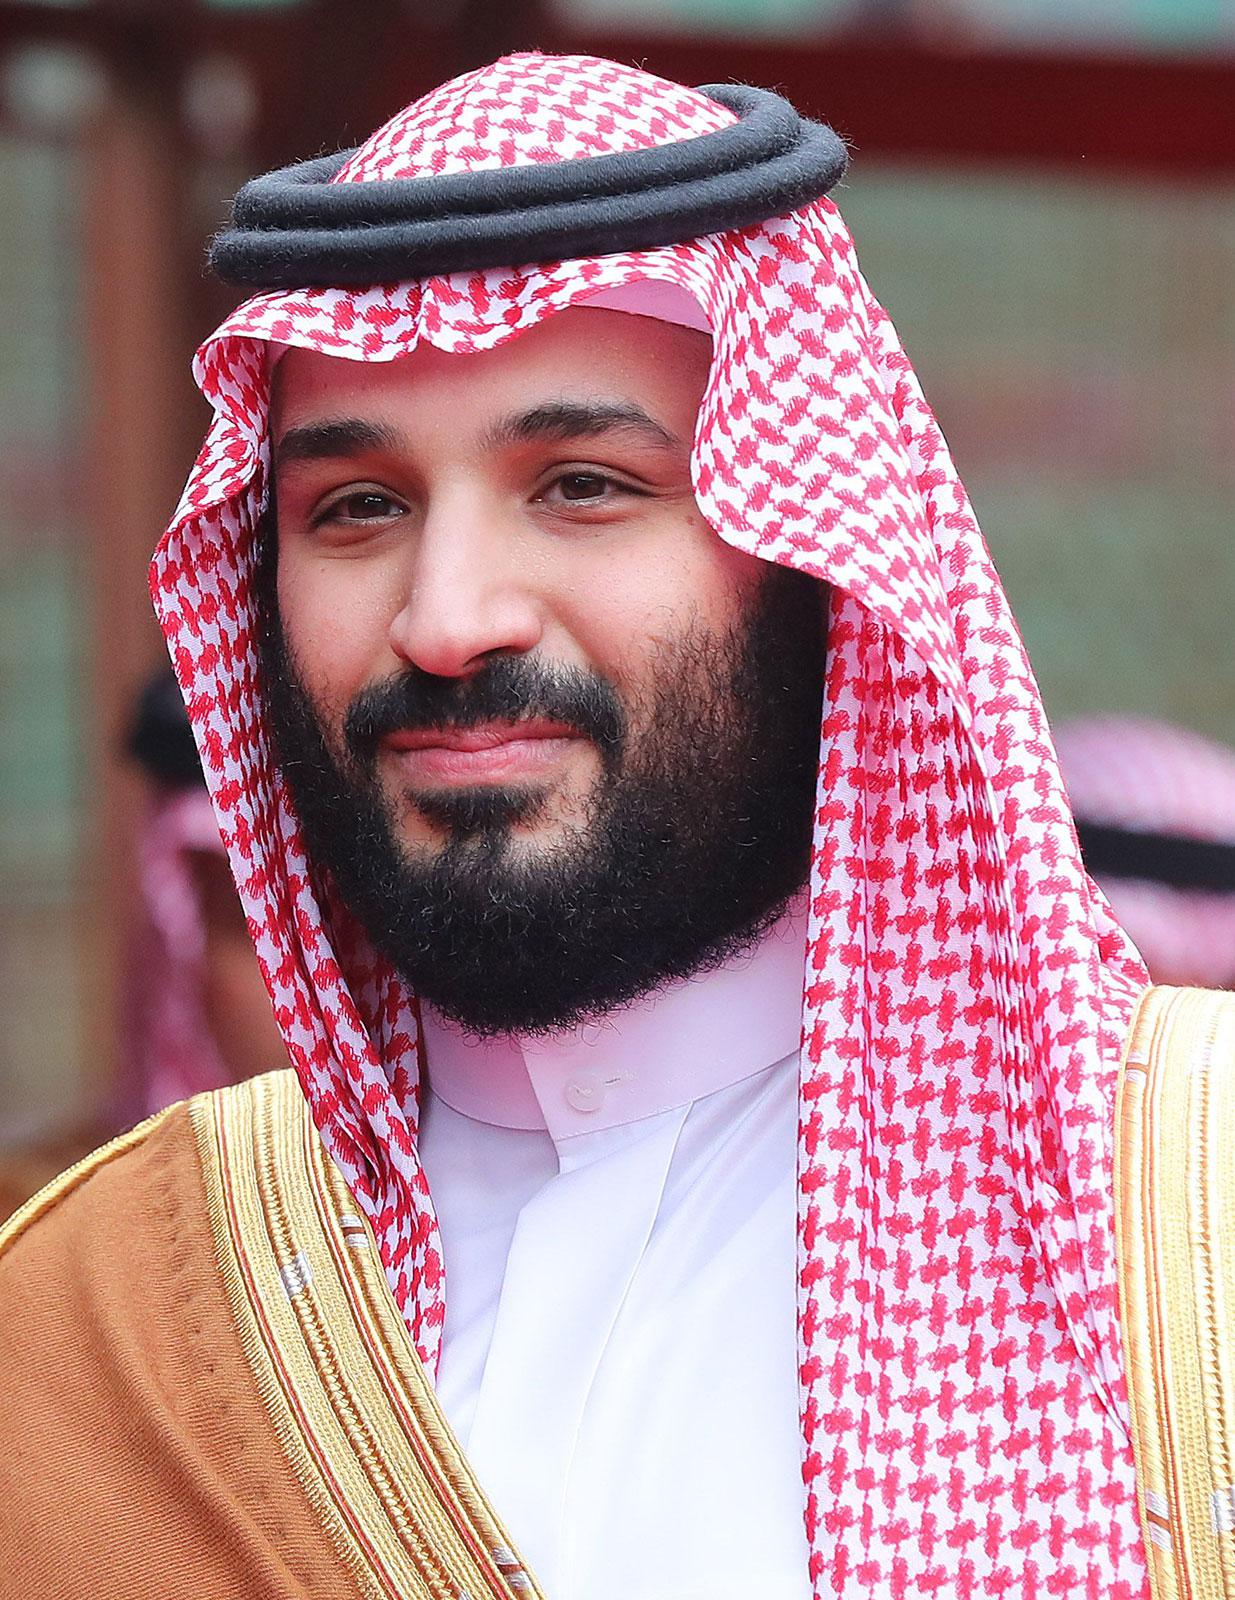 Mohammed-bin-Salman-policy-maker-Saudi-k